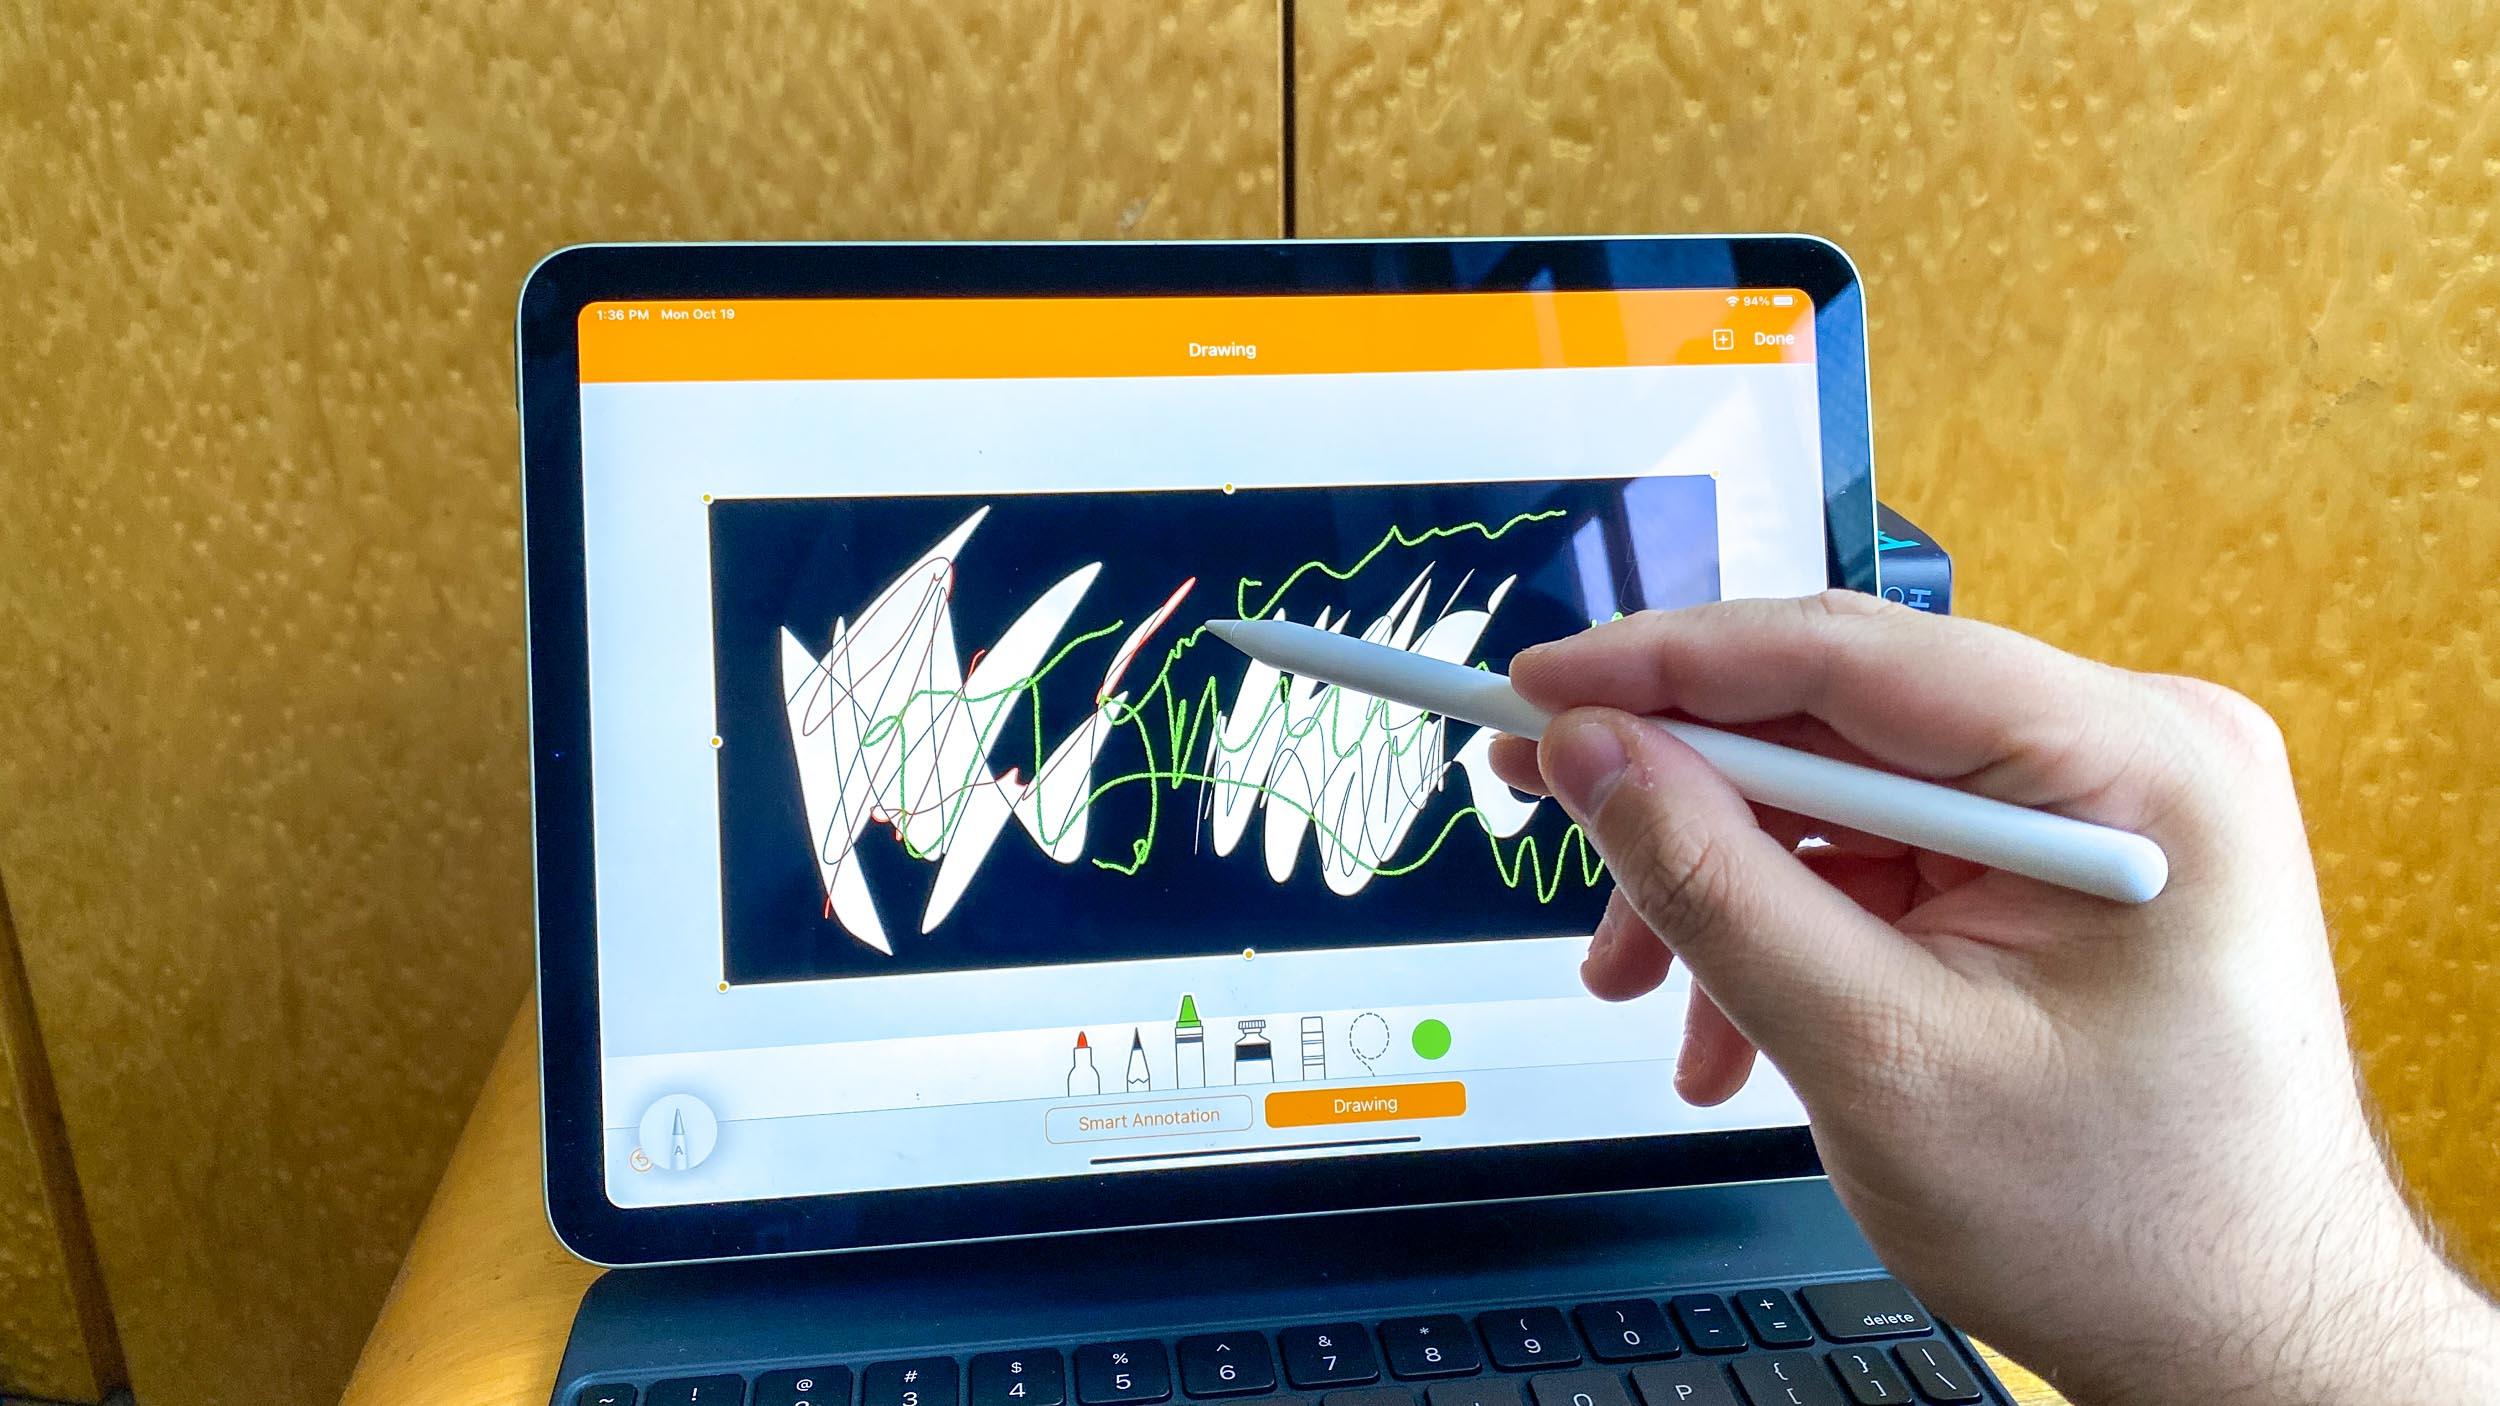 iPad Air 4 with magic keyboard and apple pencil